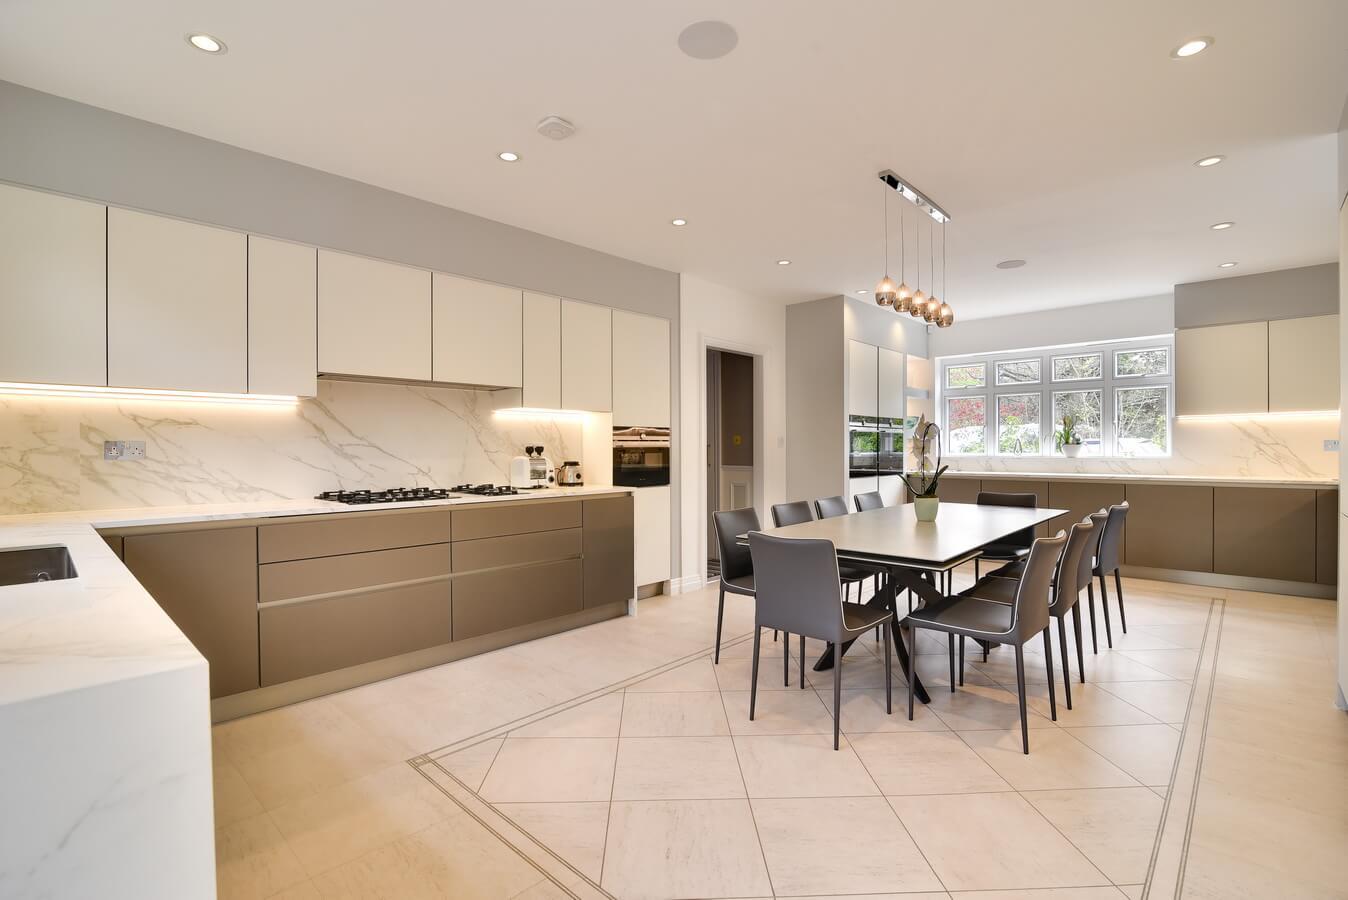 Full-View-Next125-Kitchen-German-Made.jpg